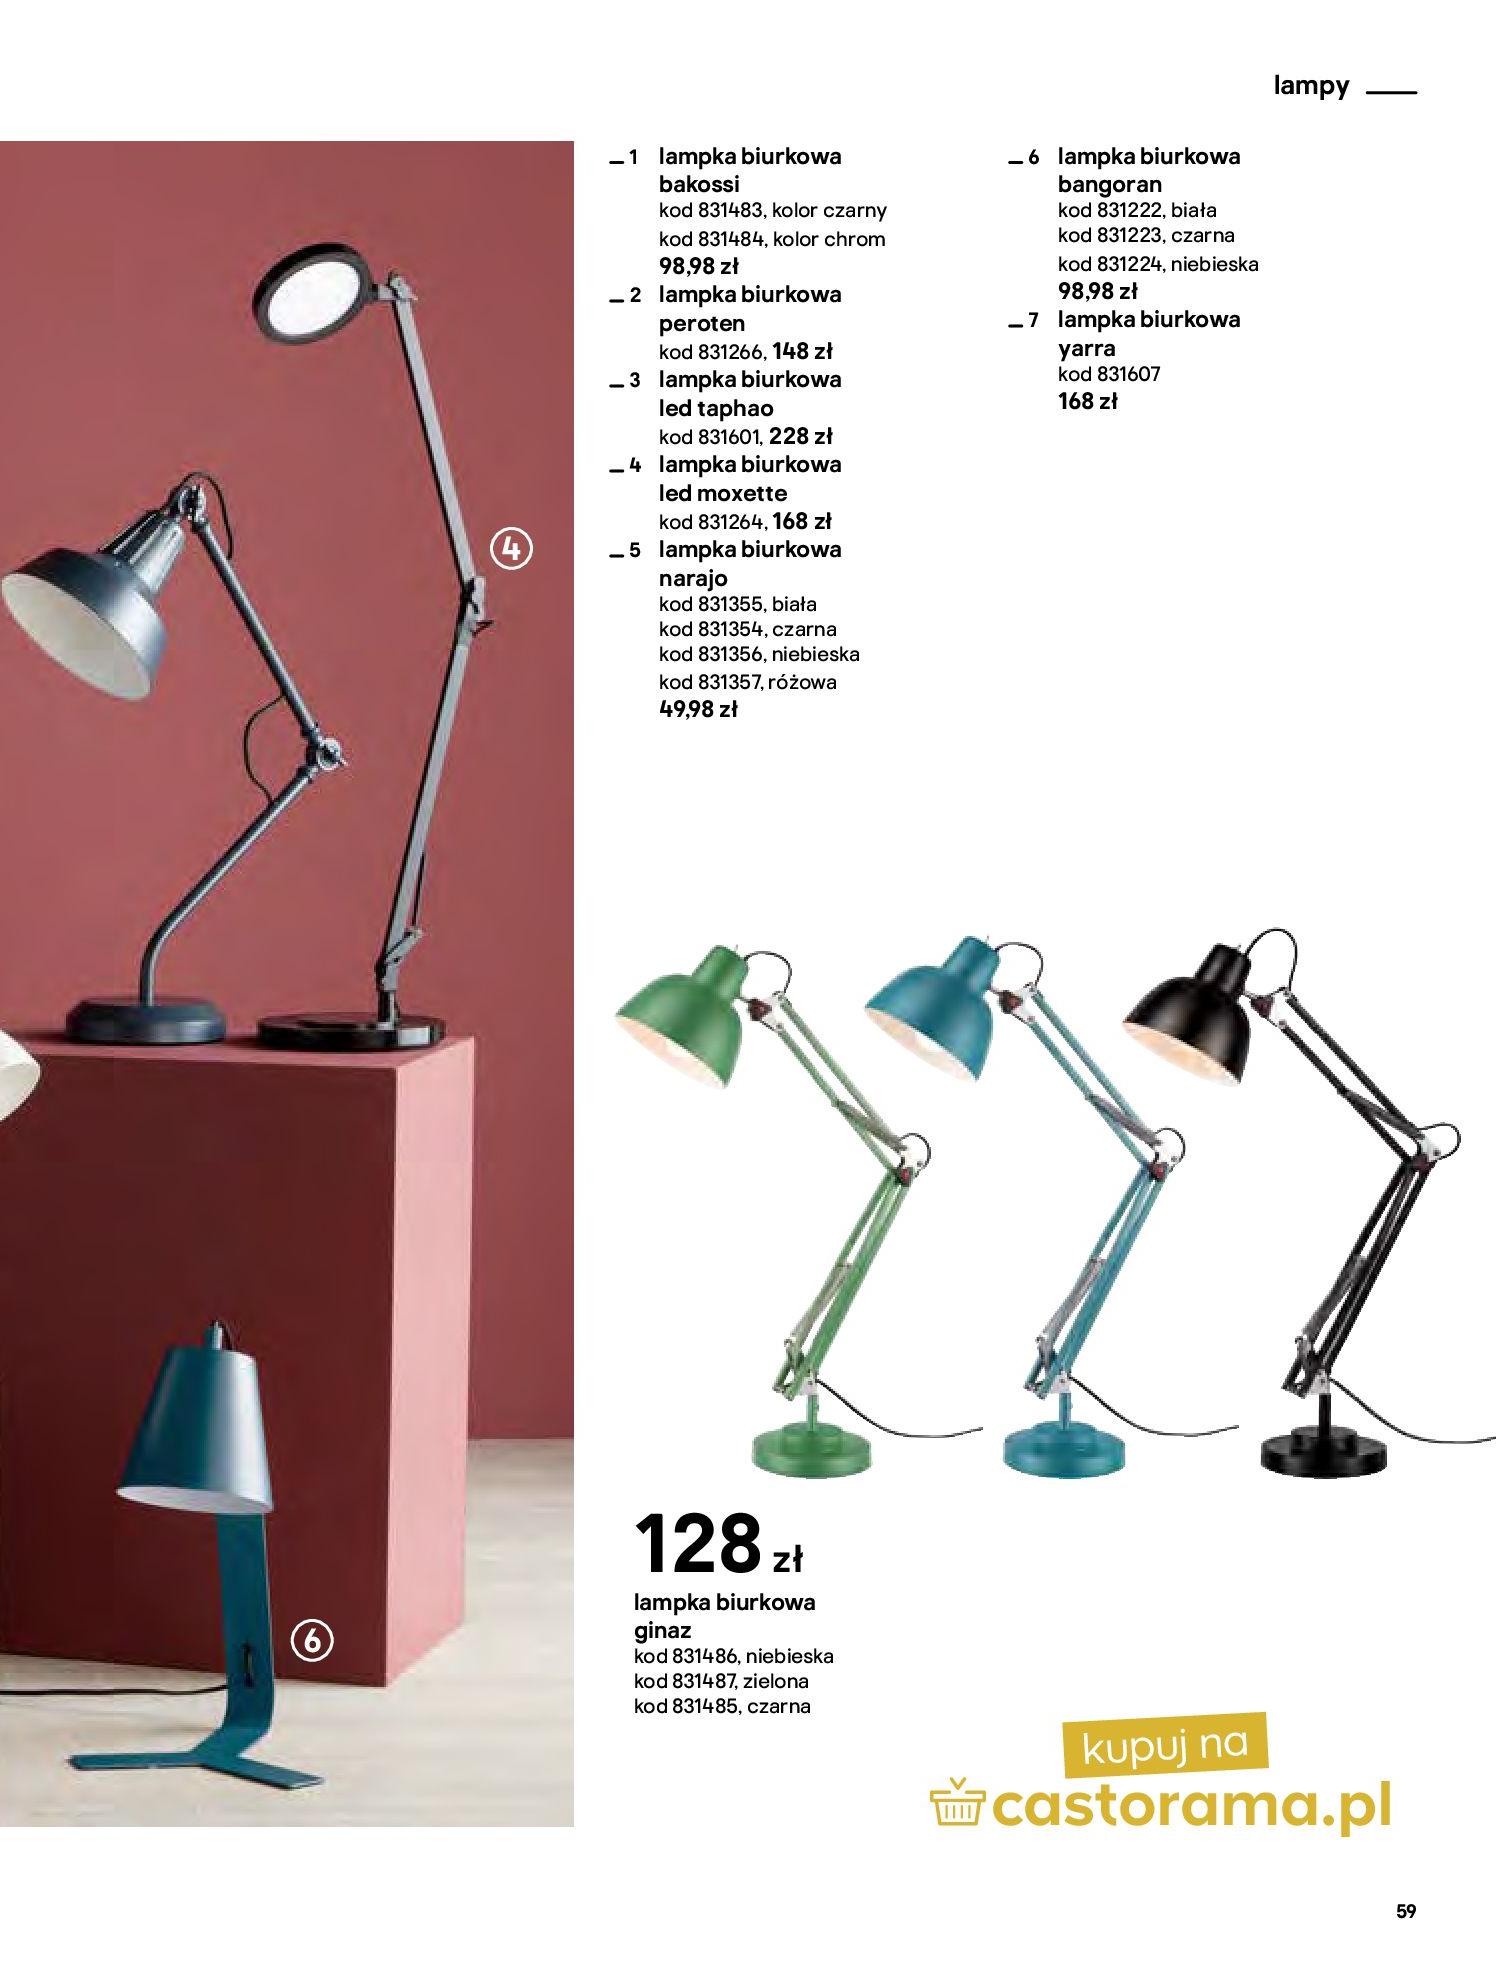 Gazetka Castorama - Katalog Dekoracje-22.10.2020-31.12.2020-page-59